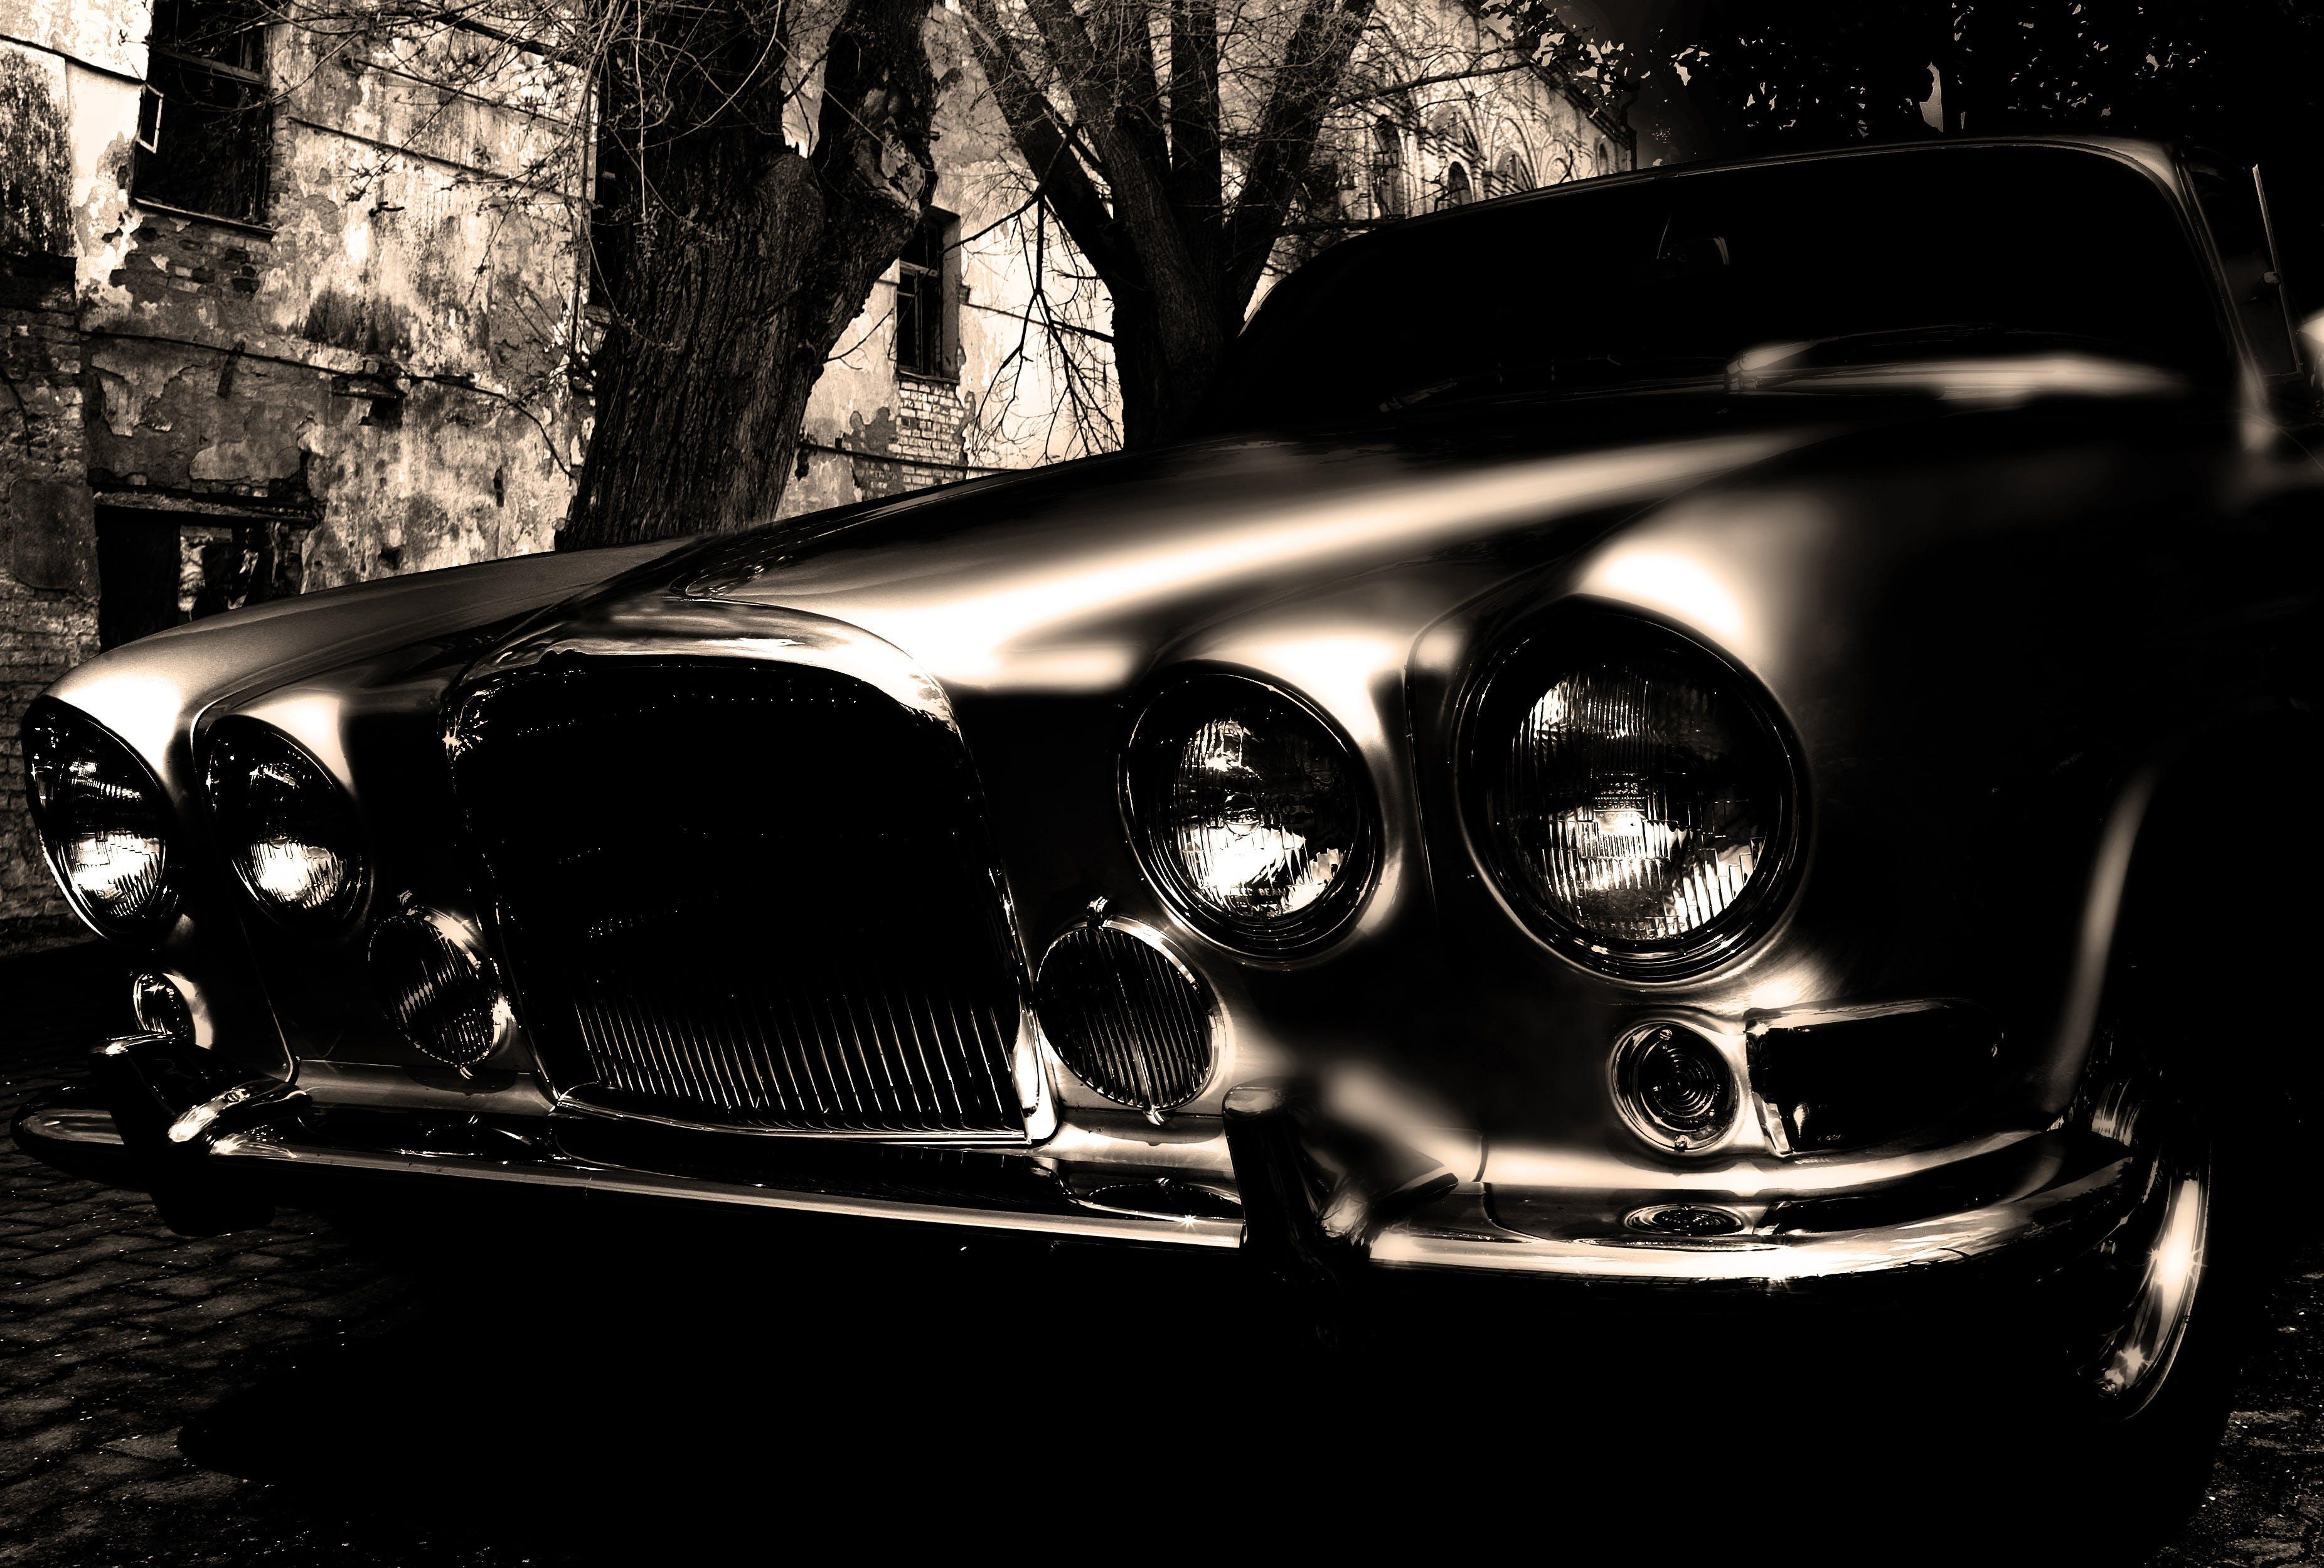 Free stock photo of art, atmosphere, automobile, car